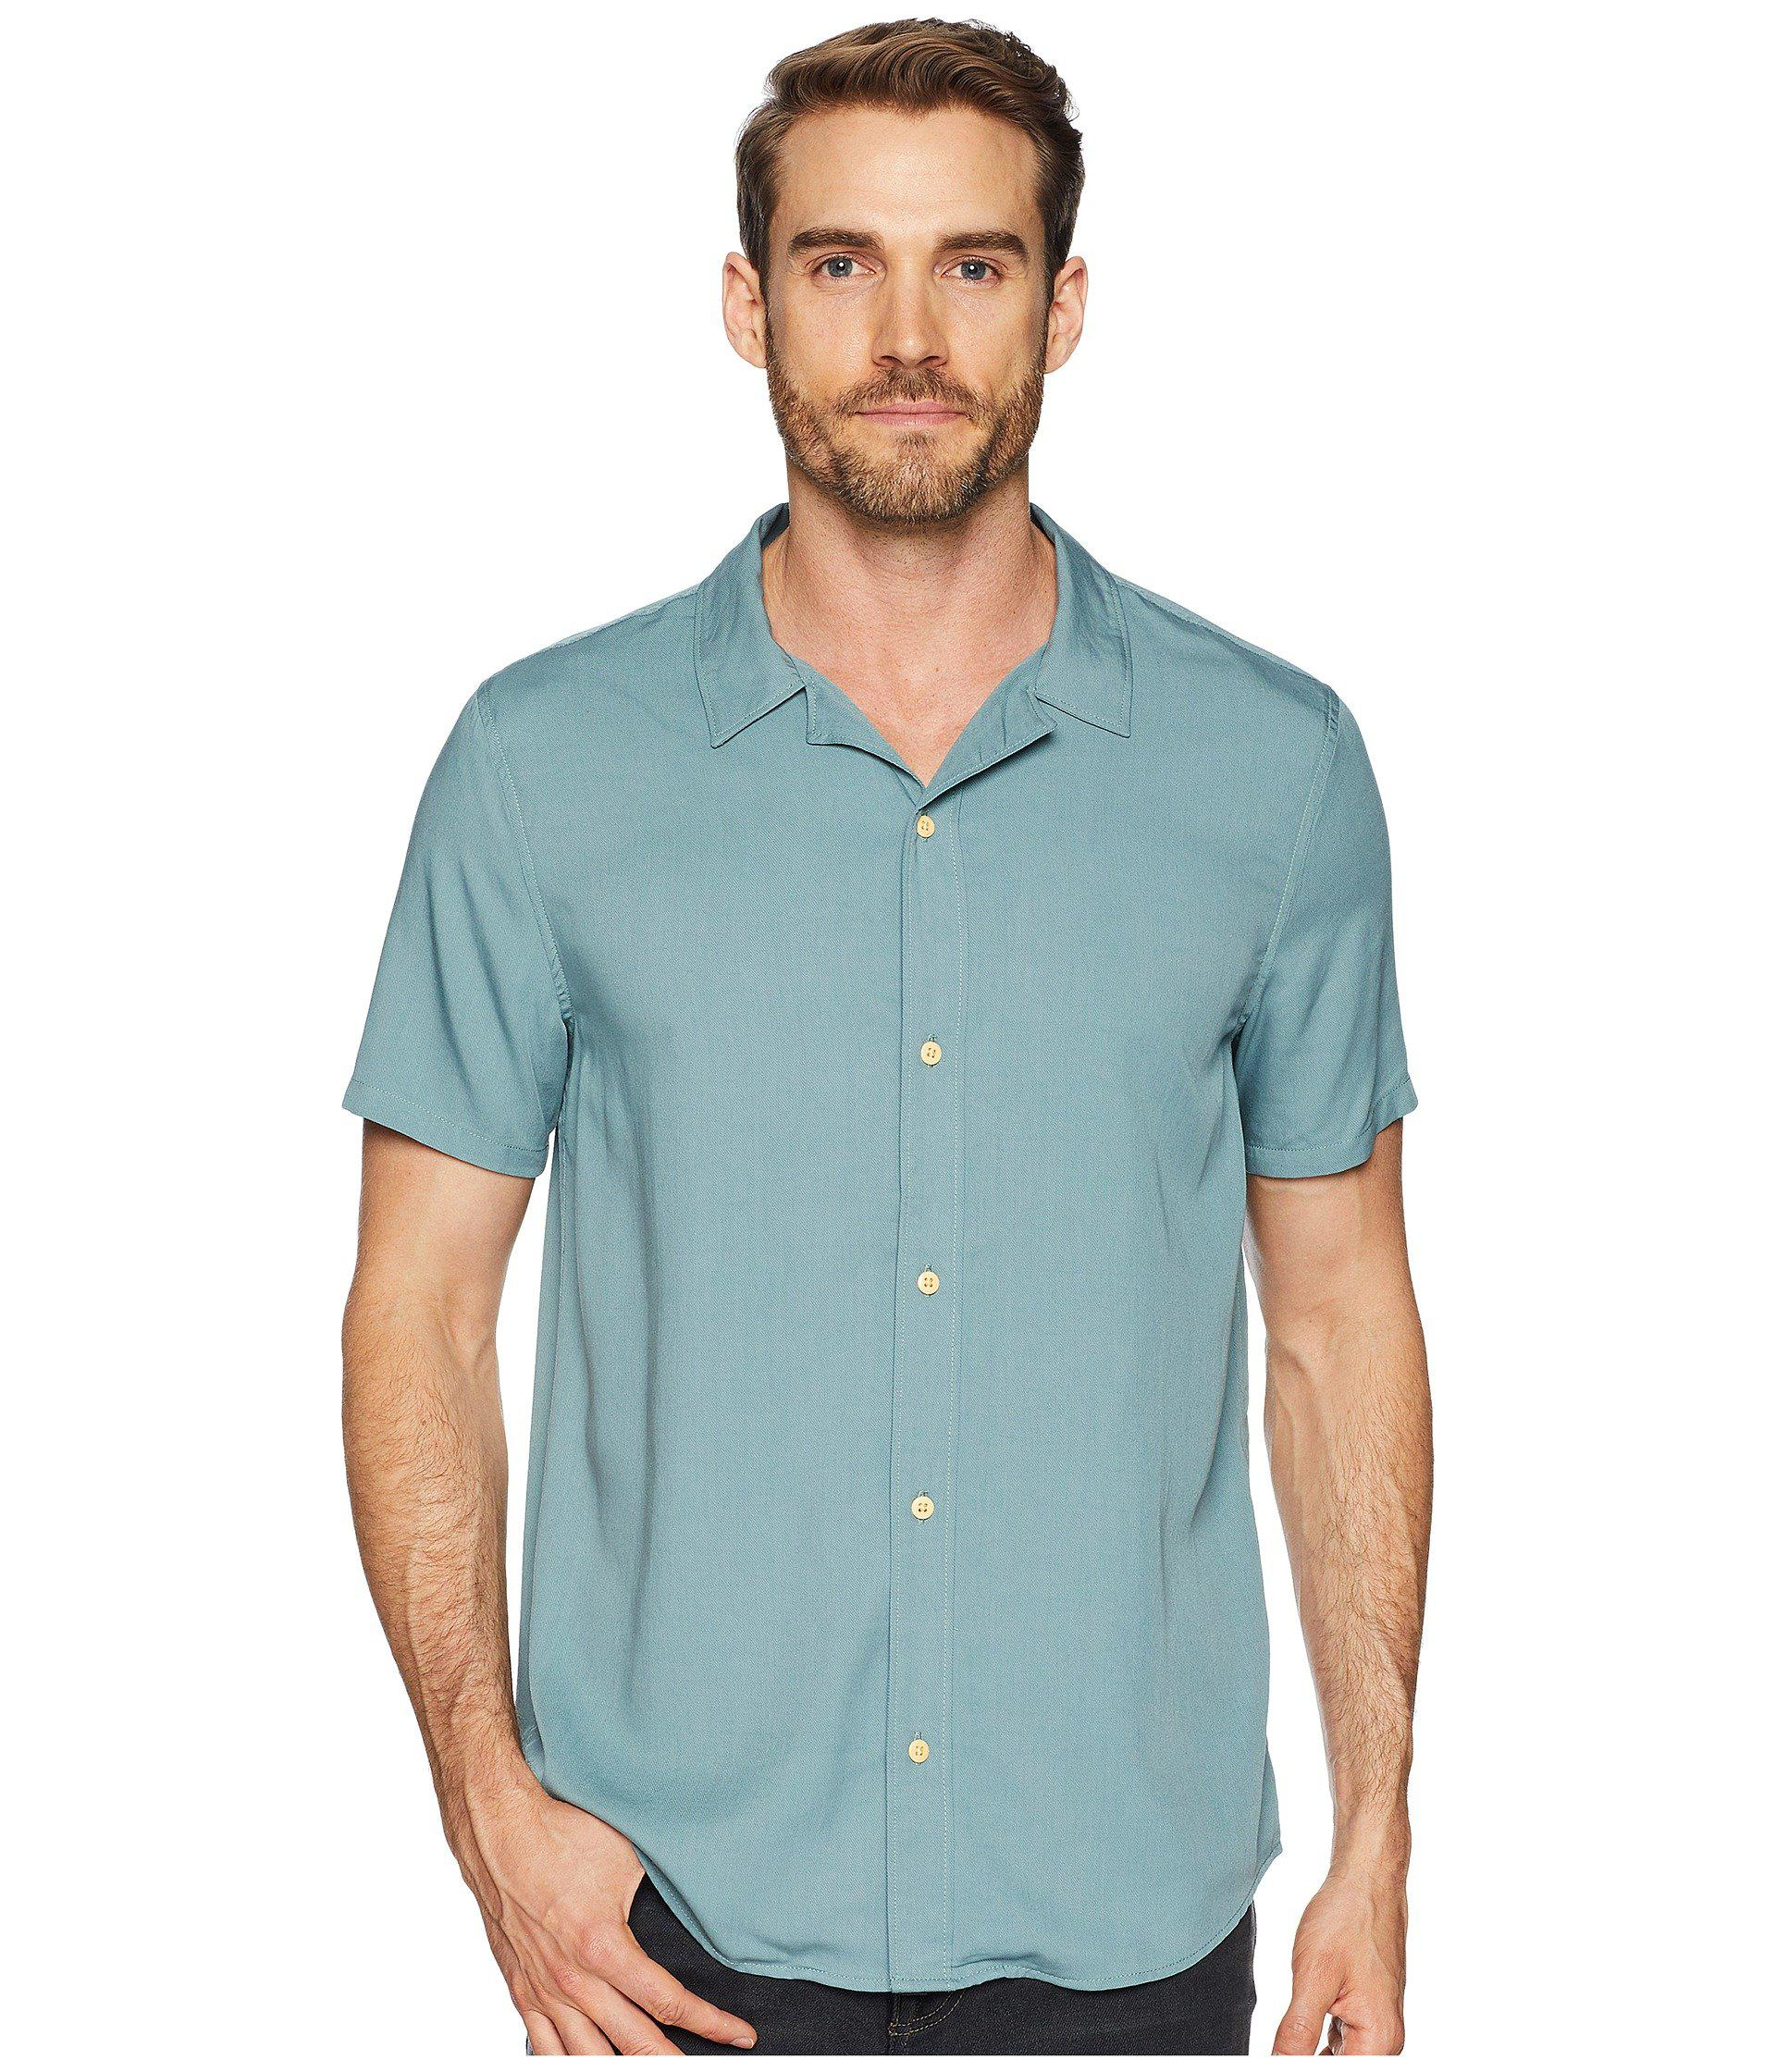 445d887660 Lyst - Threads For Thought Modal Short Sleeve Beach Shirt in Green ...